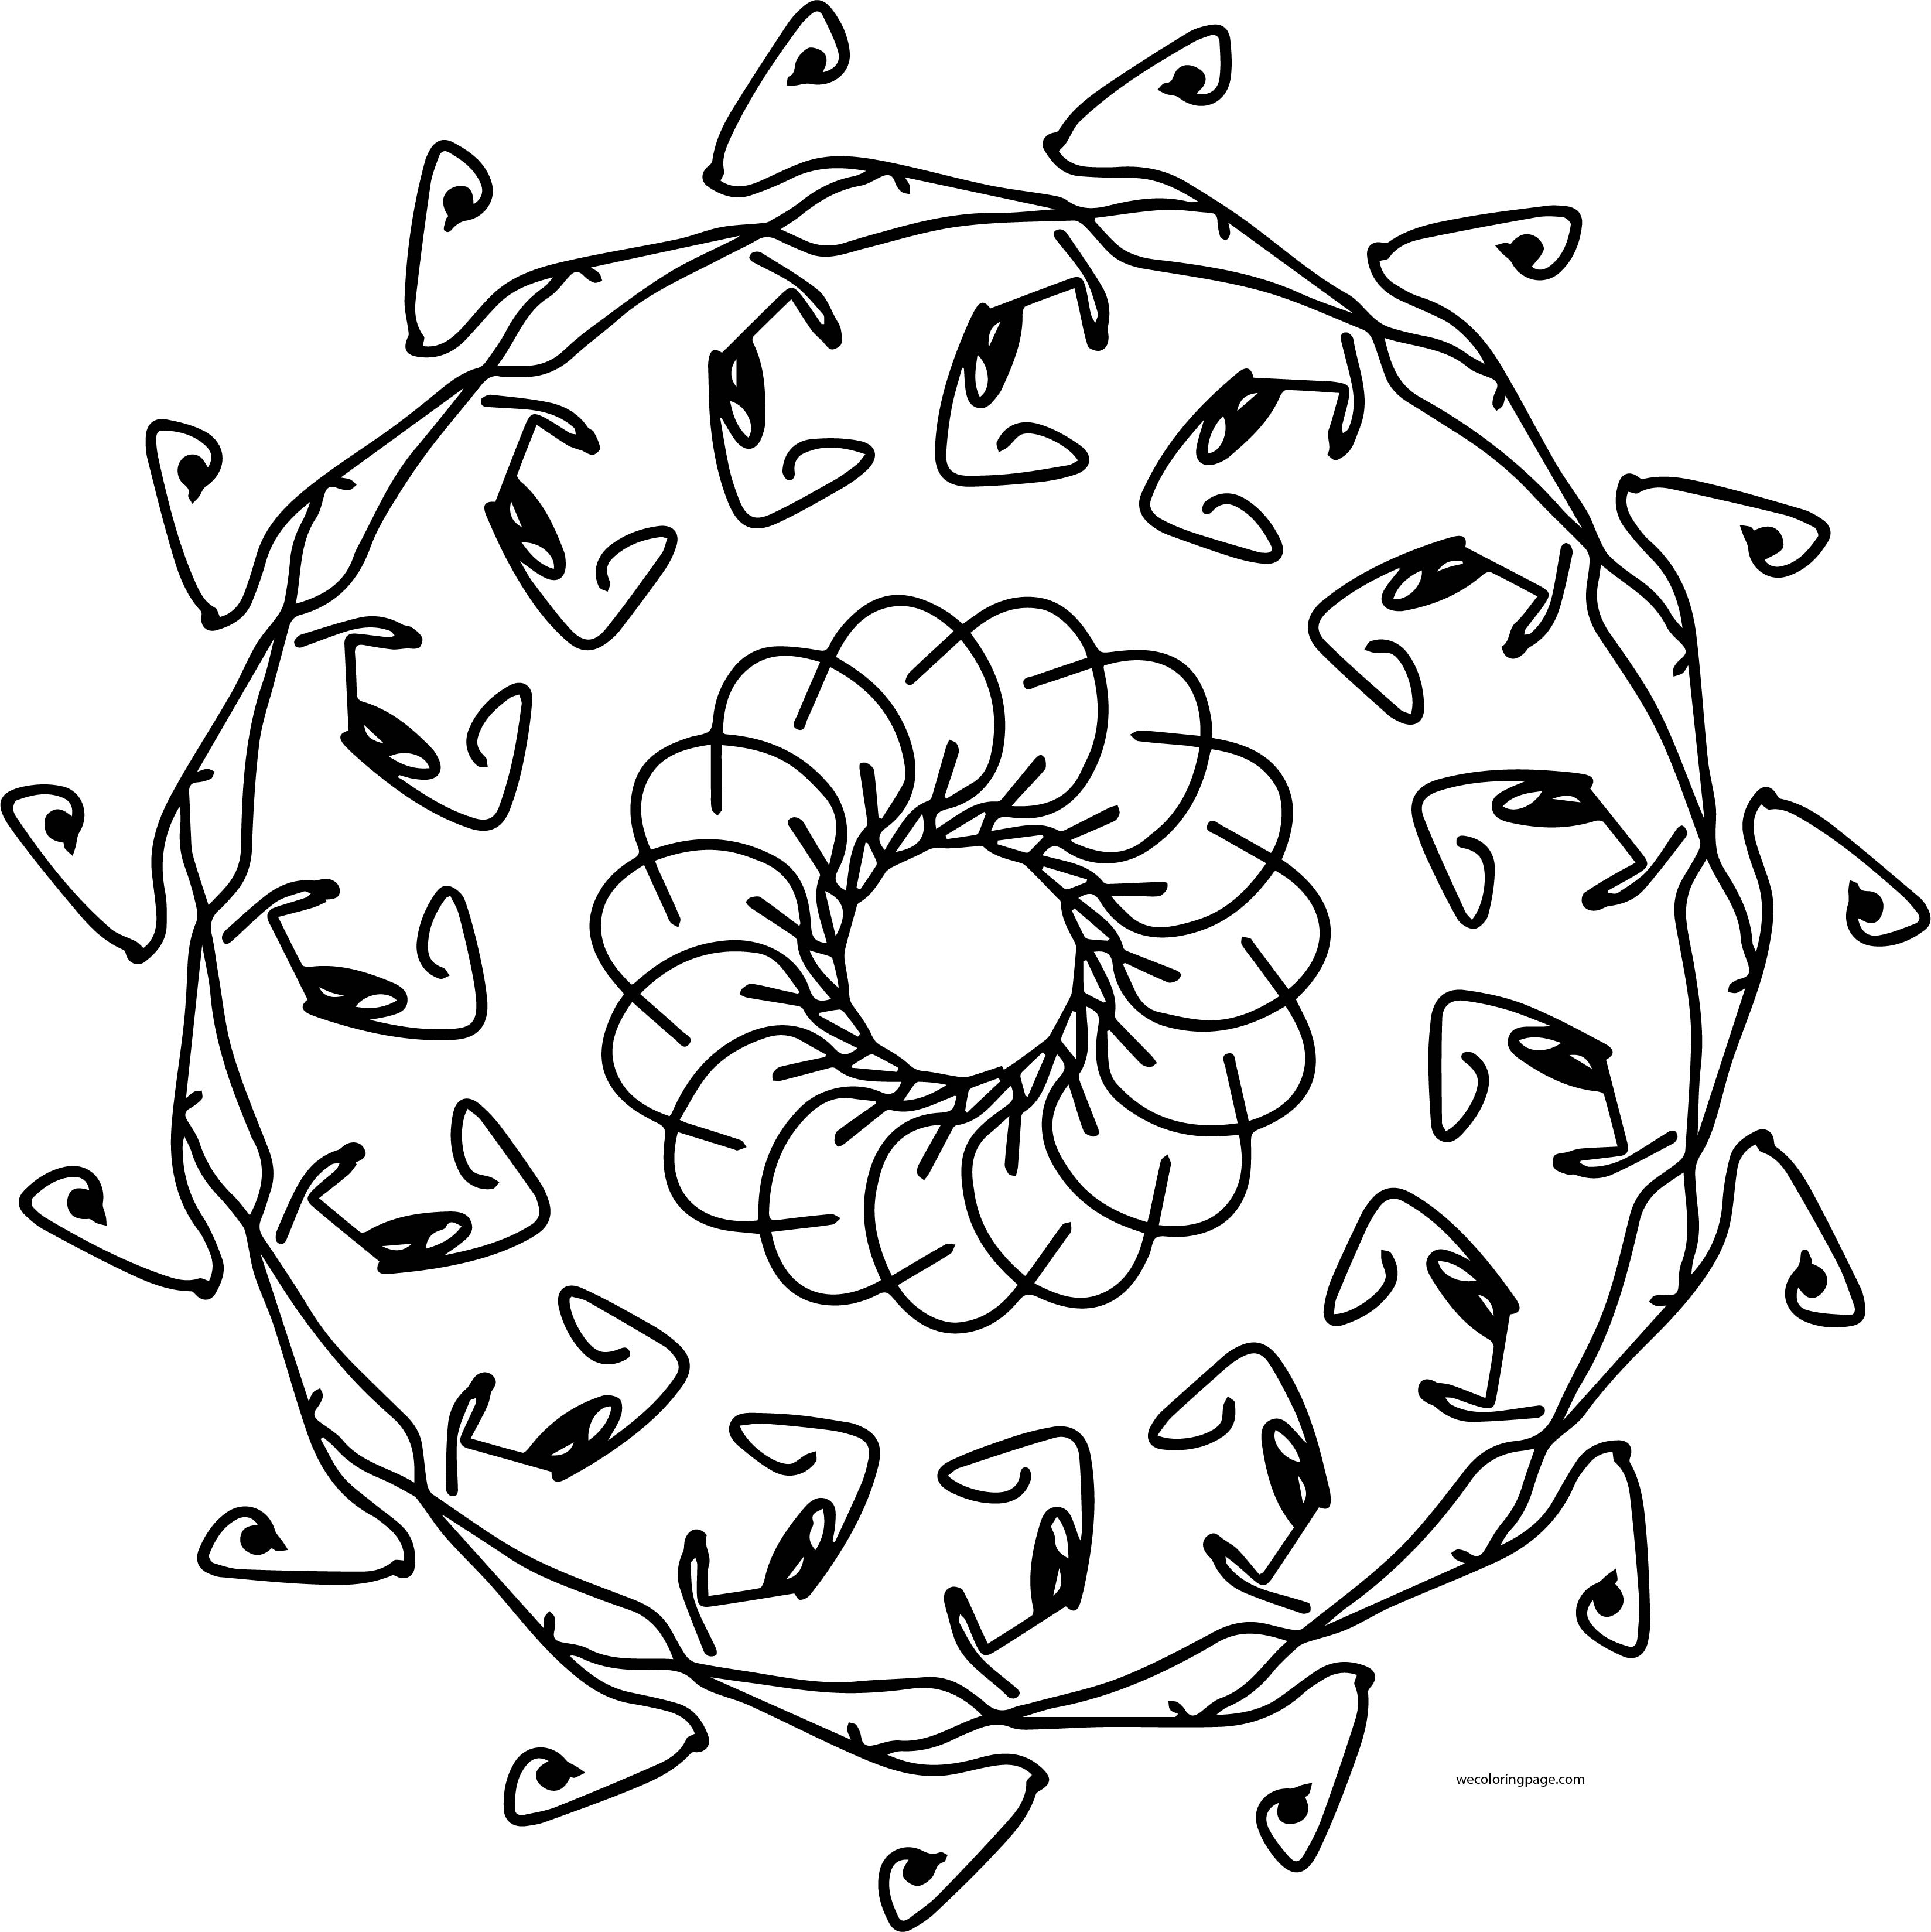 Mandala Shape Style Coloring Page 85